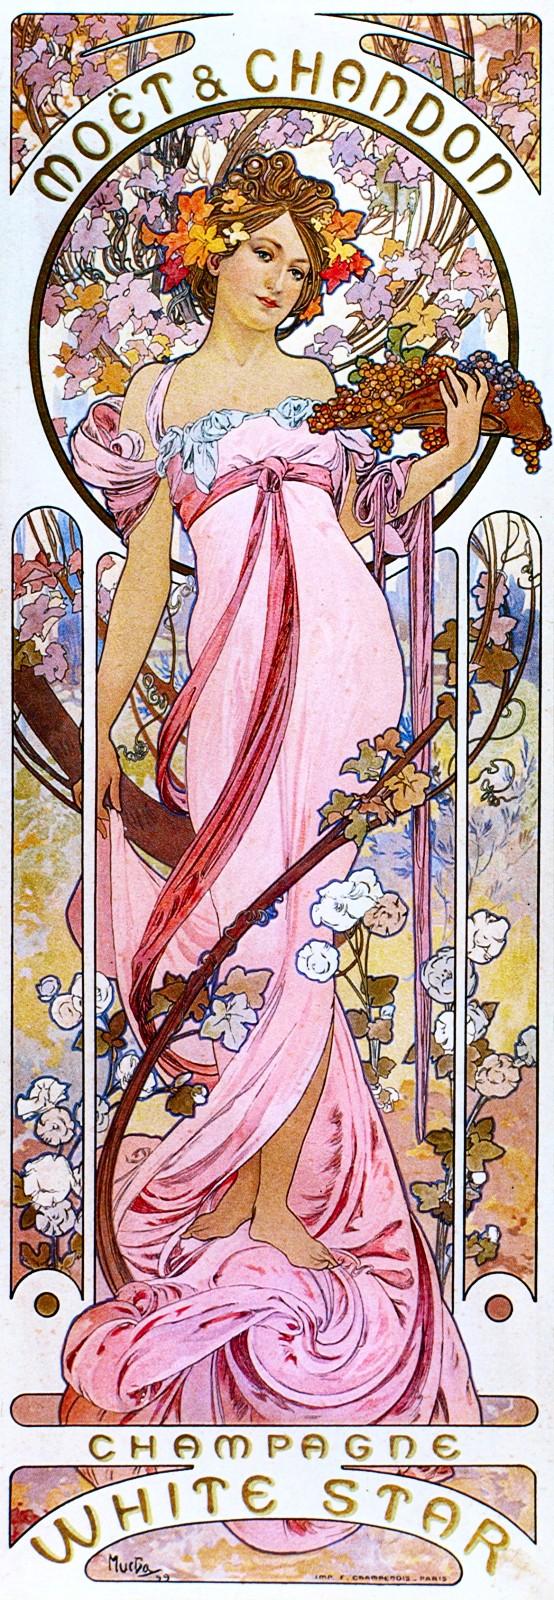 Реклама шампанского White Star марки Moet & Chandon-1899